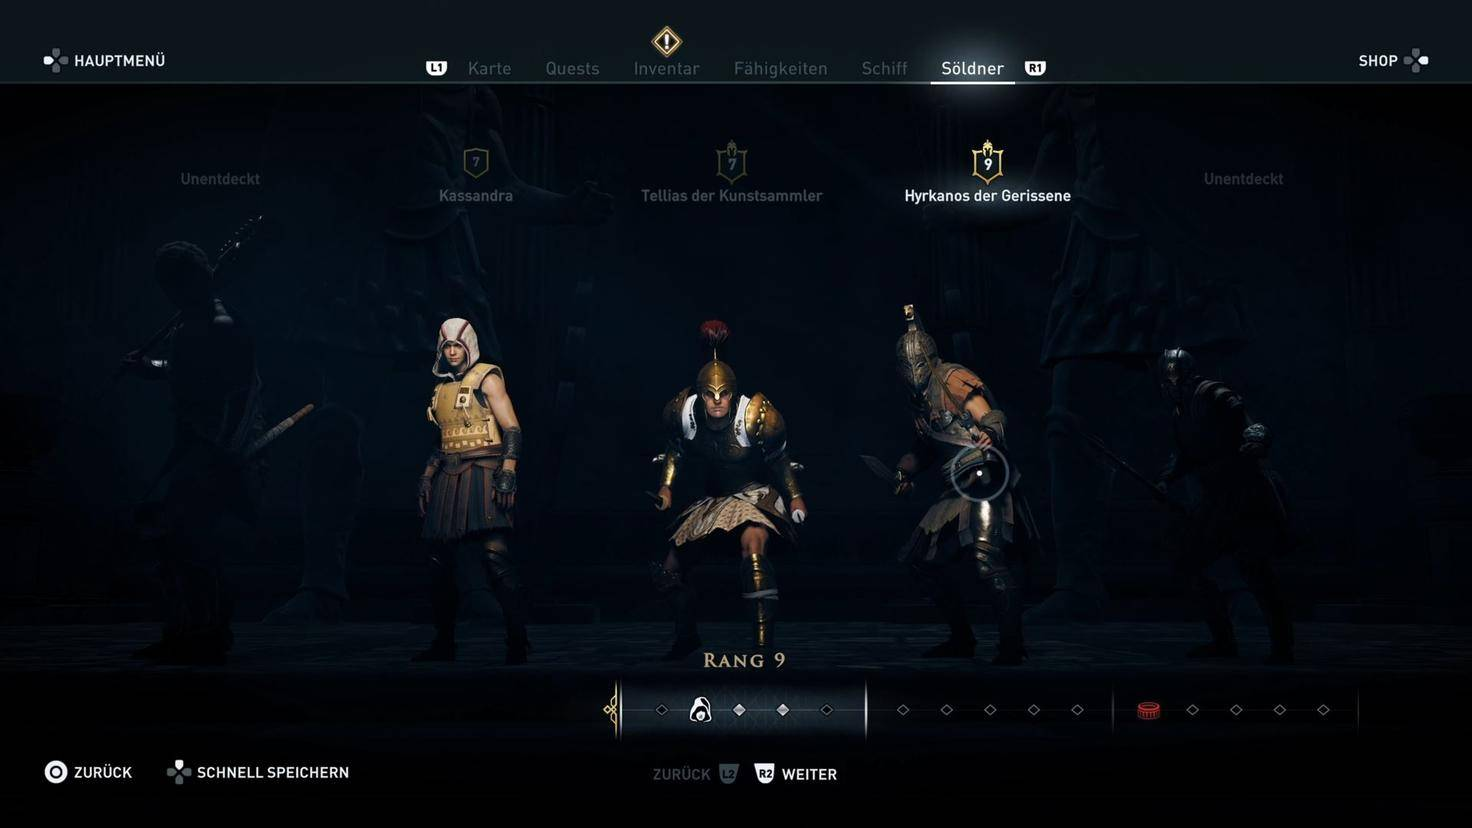 Assassins Creed Odyssey Söldnerrangliste